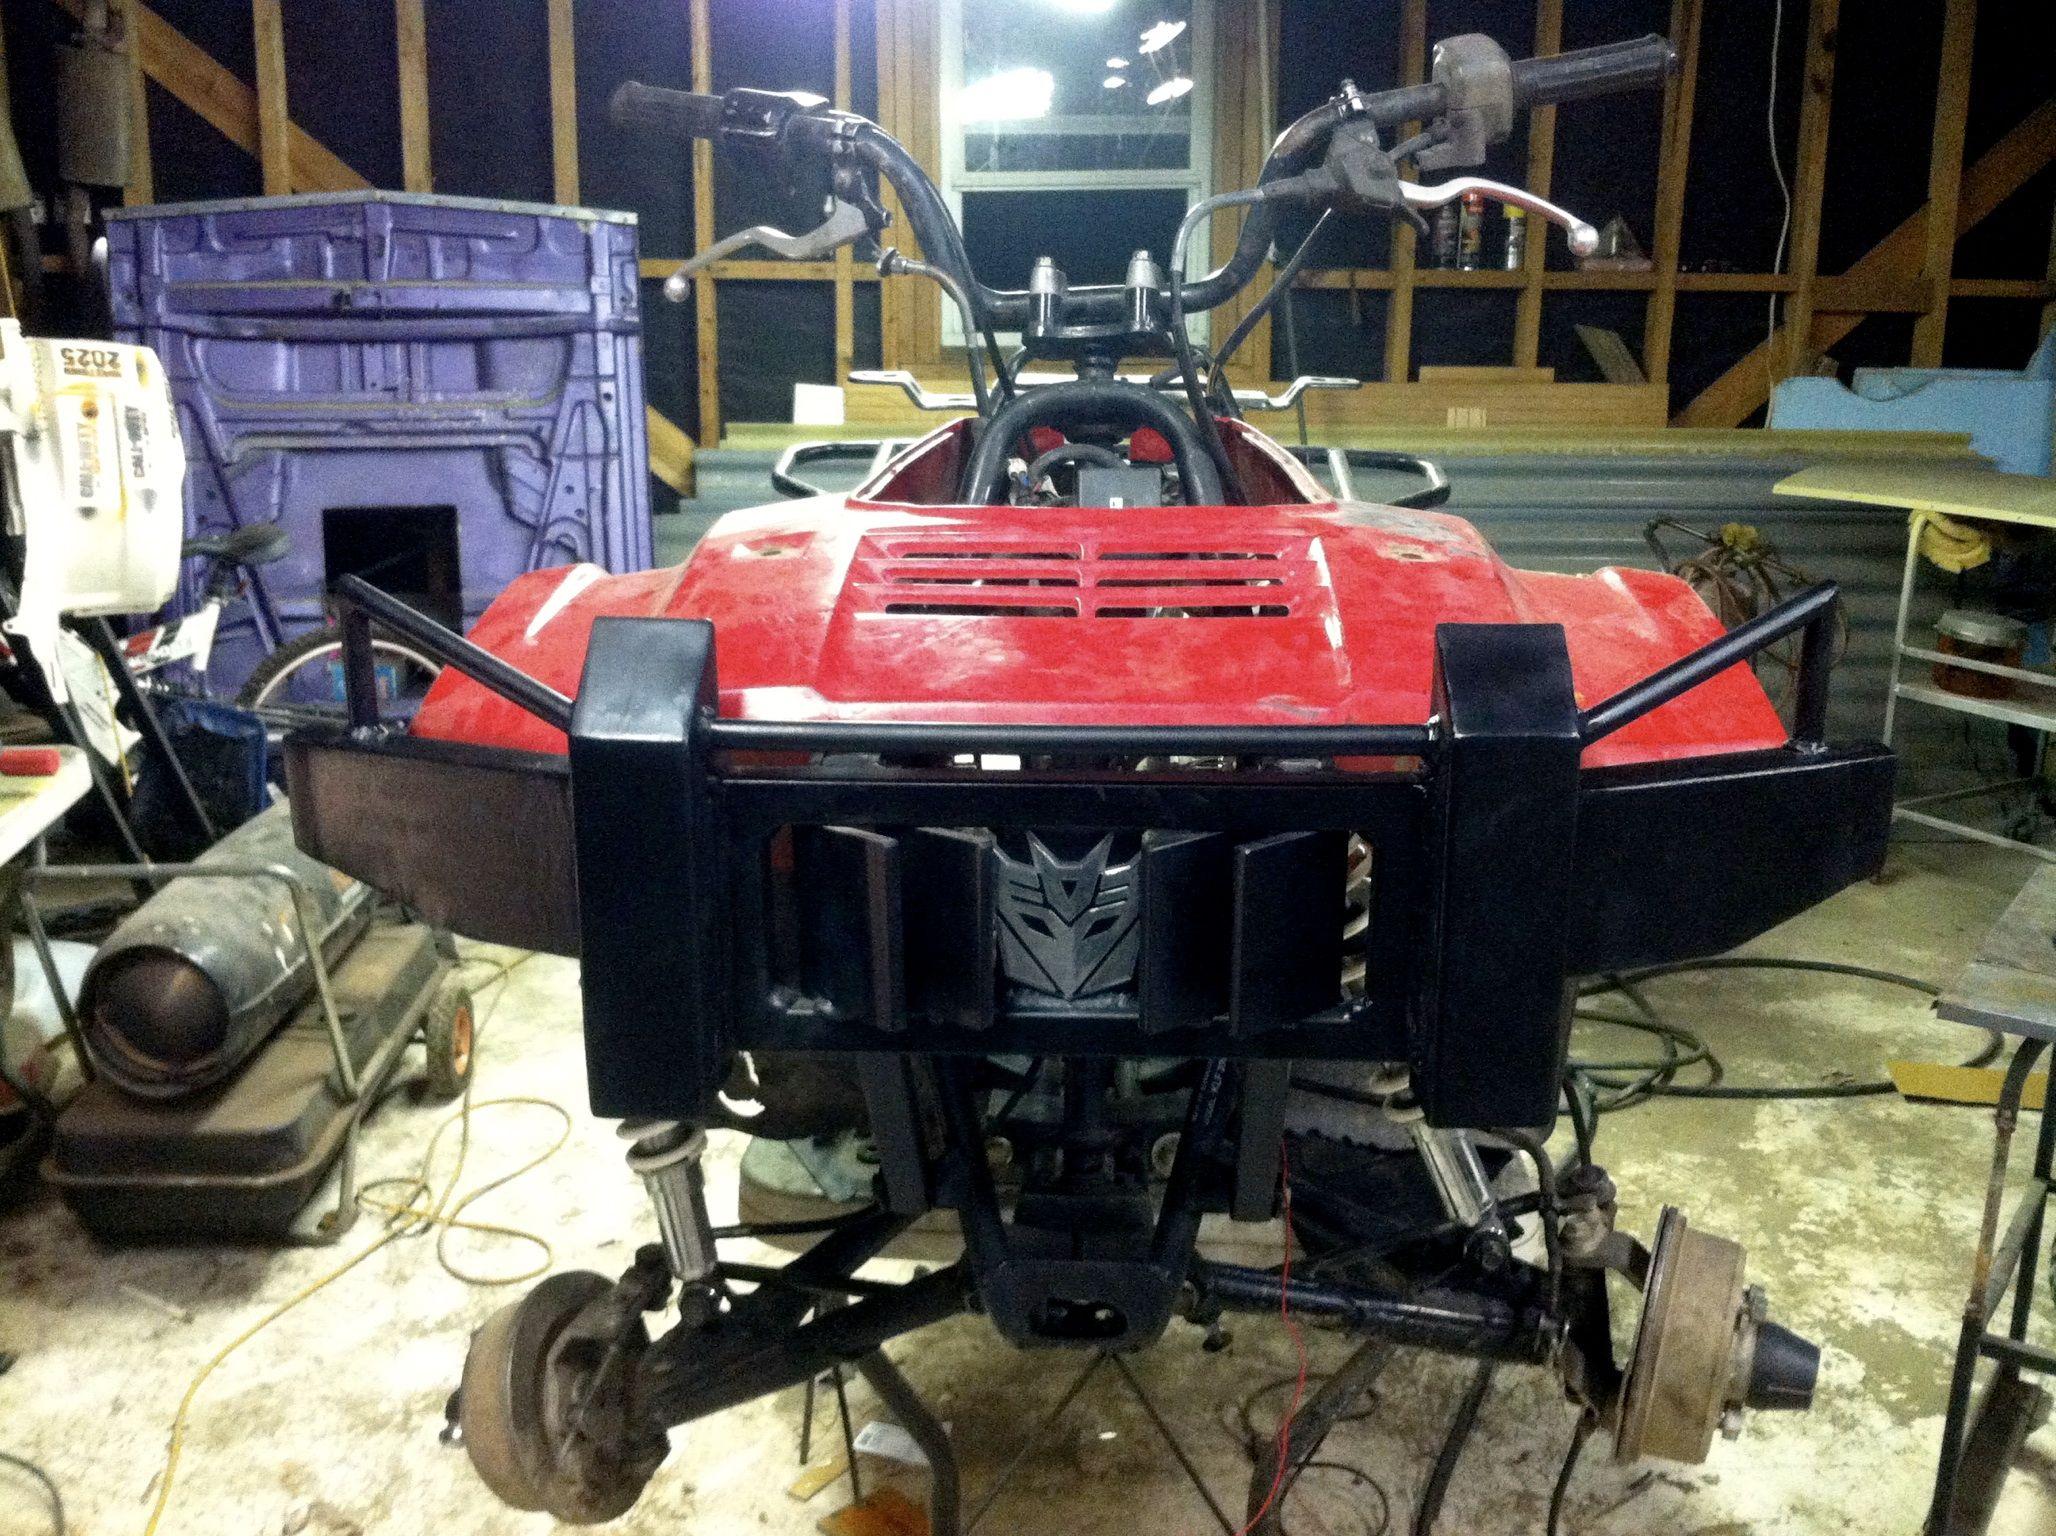 Built by shawn floyd custom atv four wheeler front bumper more